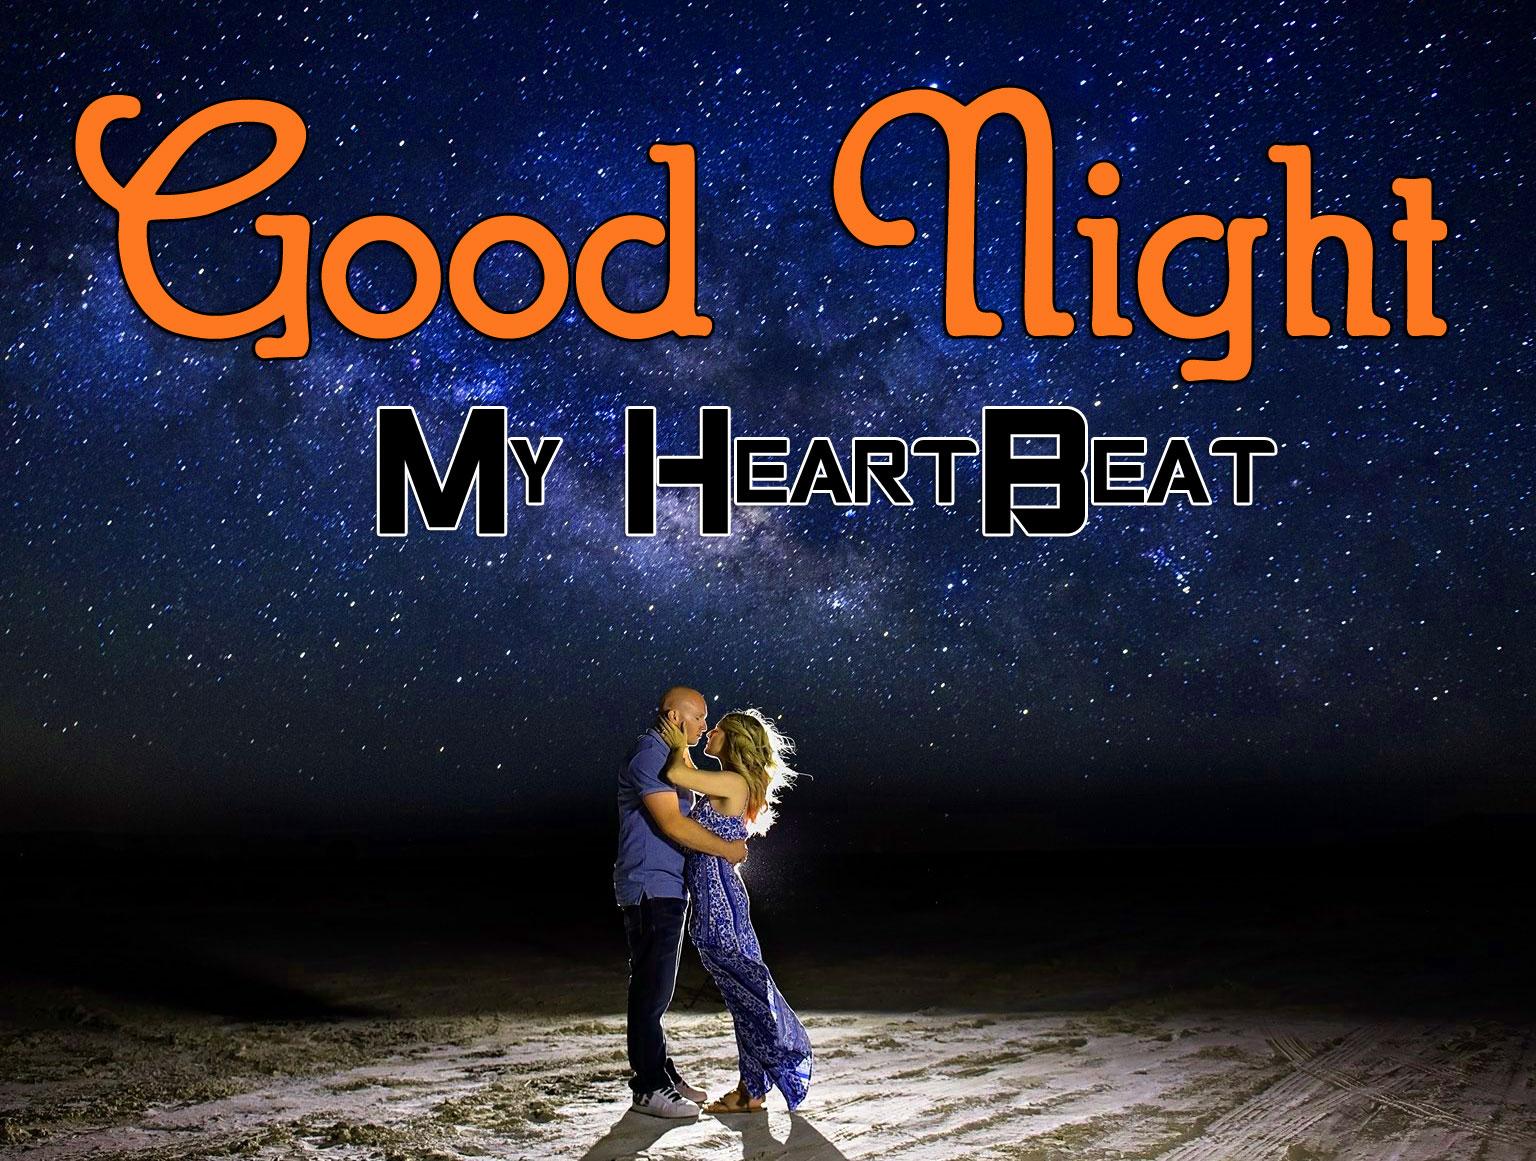 FreeGirlfriend Good Night Wishes Pics Download